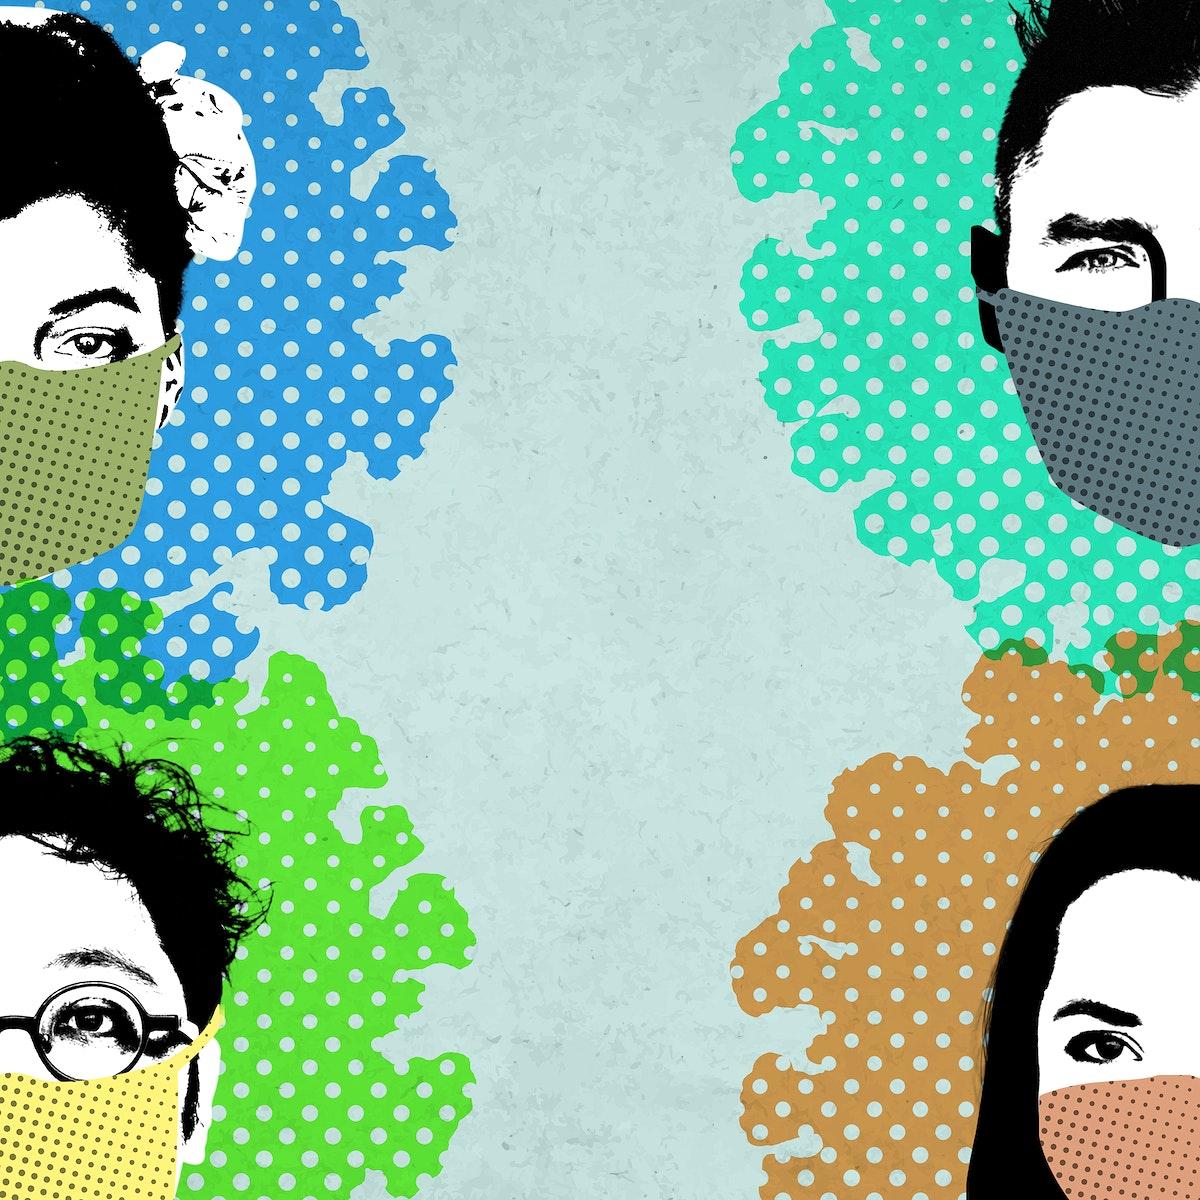 People wearing face masks in public during coronavirus pandemic background